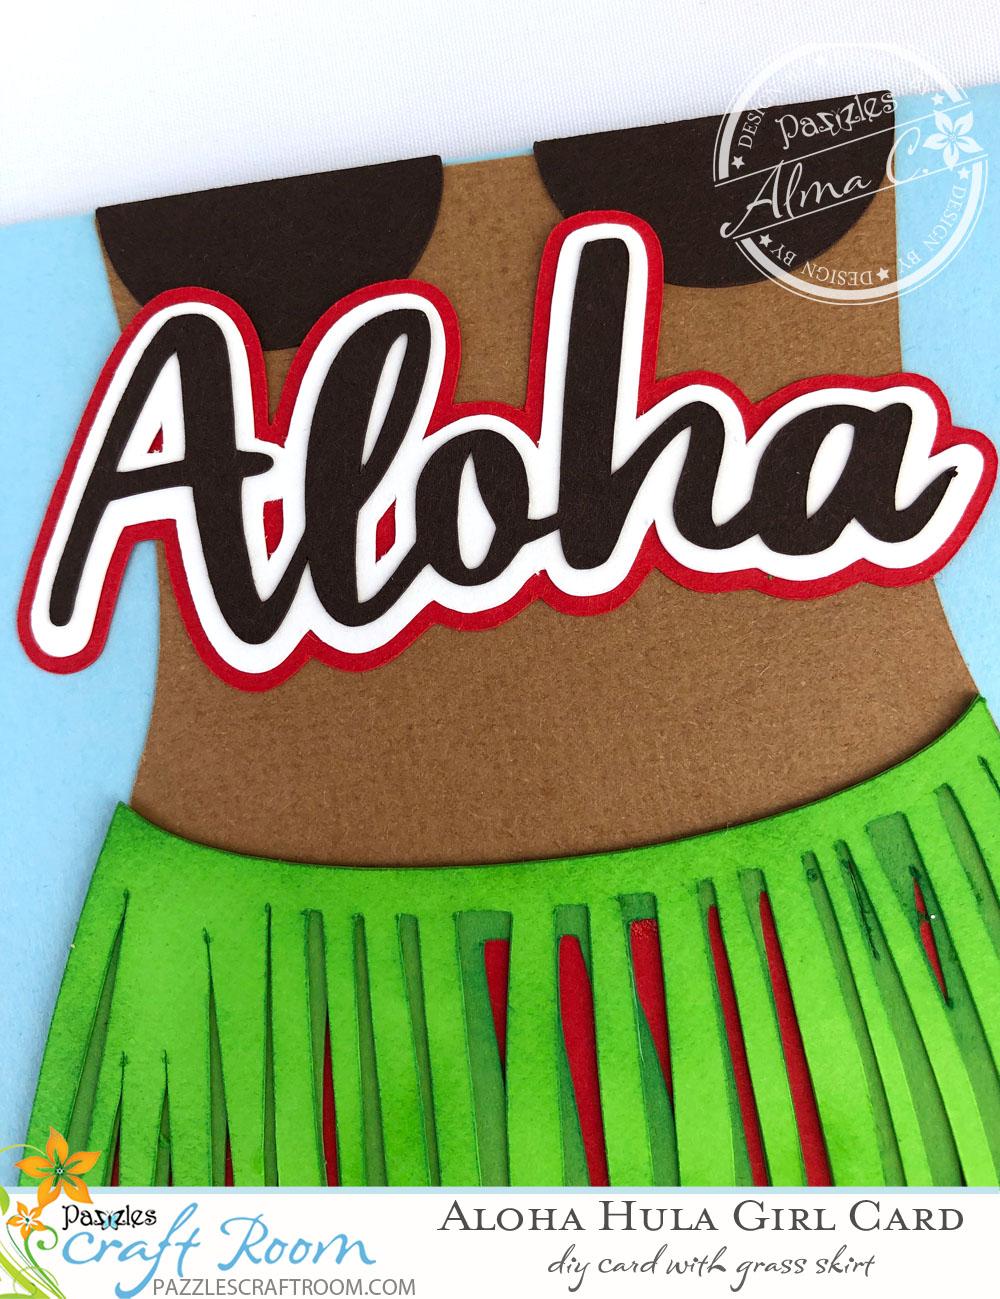 Pazzles DIY Aloha Hula Girl Card by Alma Cervantes